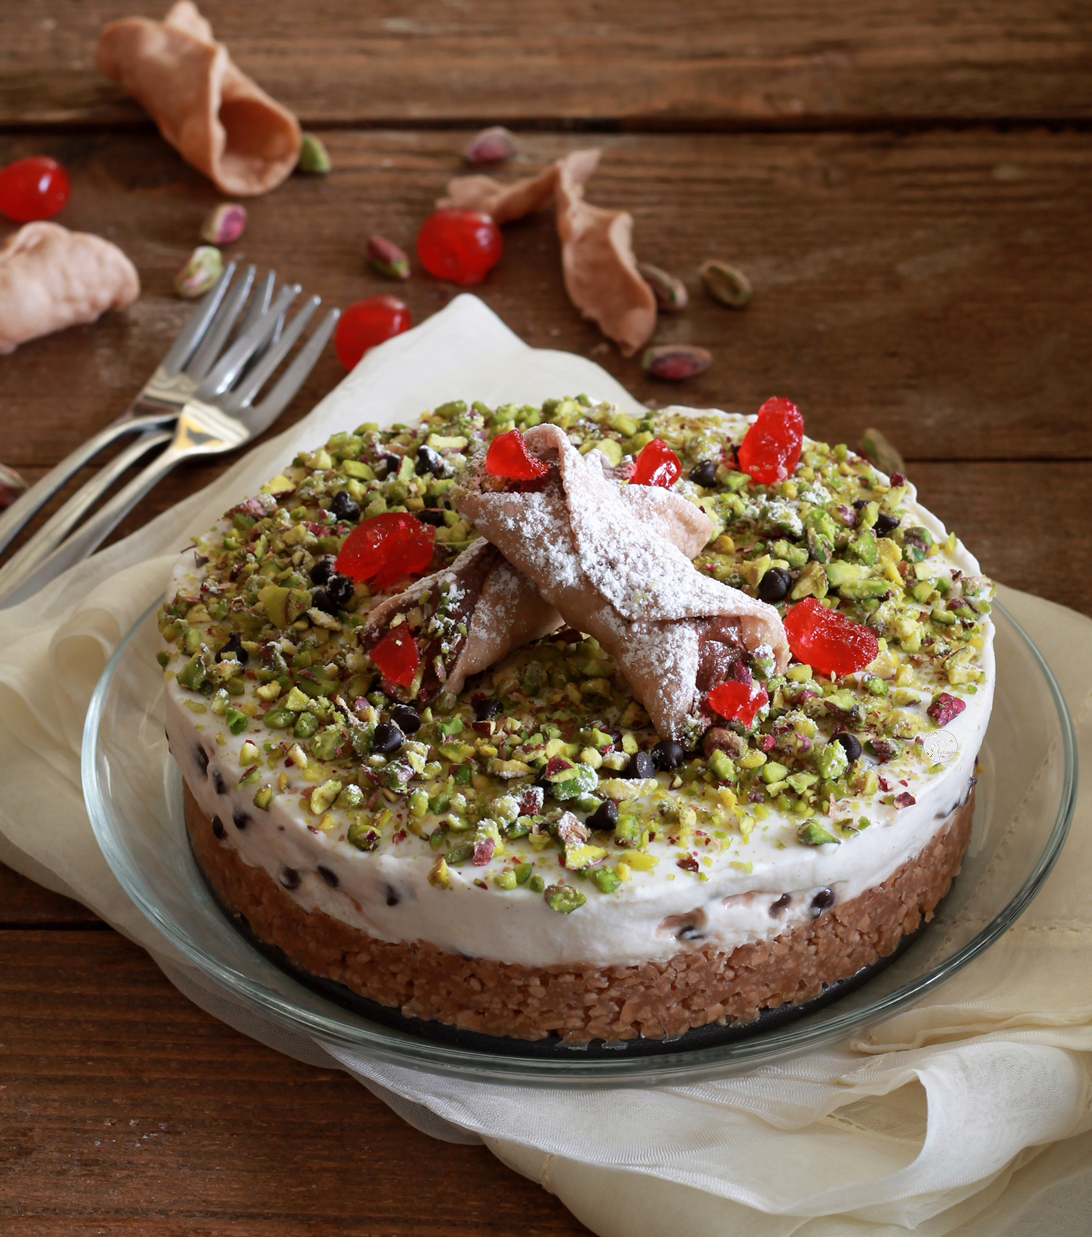 Torta cannolo senza glutine - La Cassata Celiaca